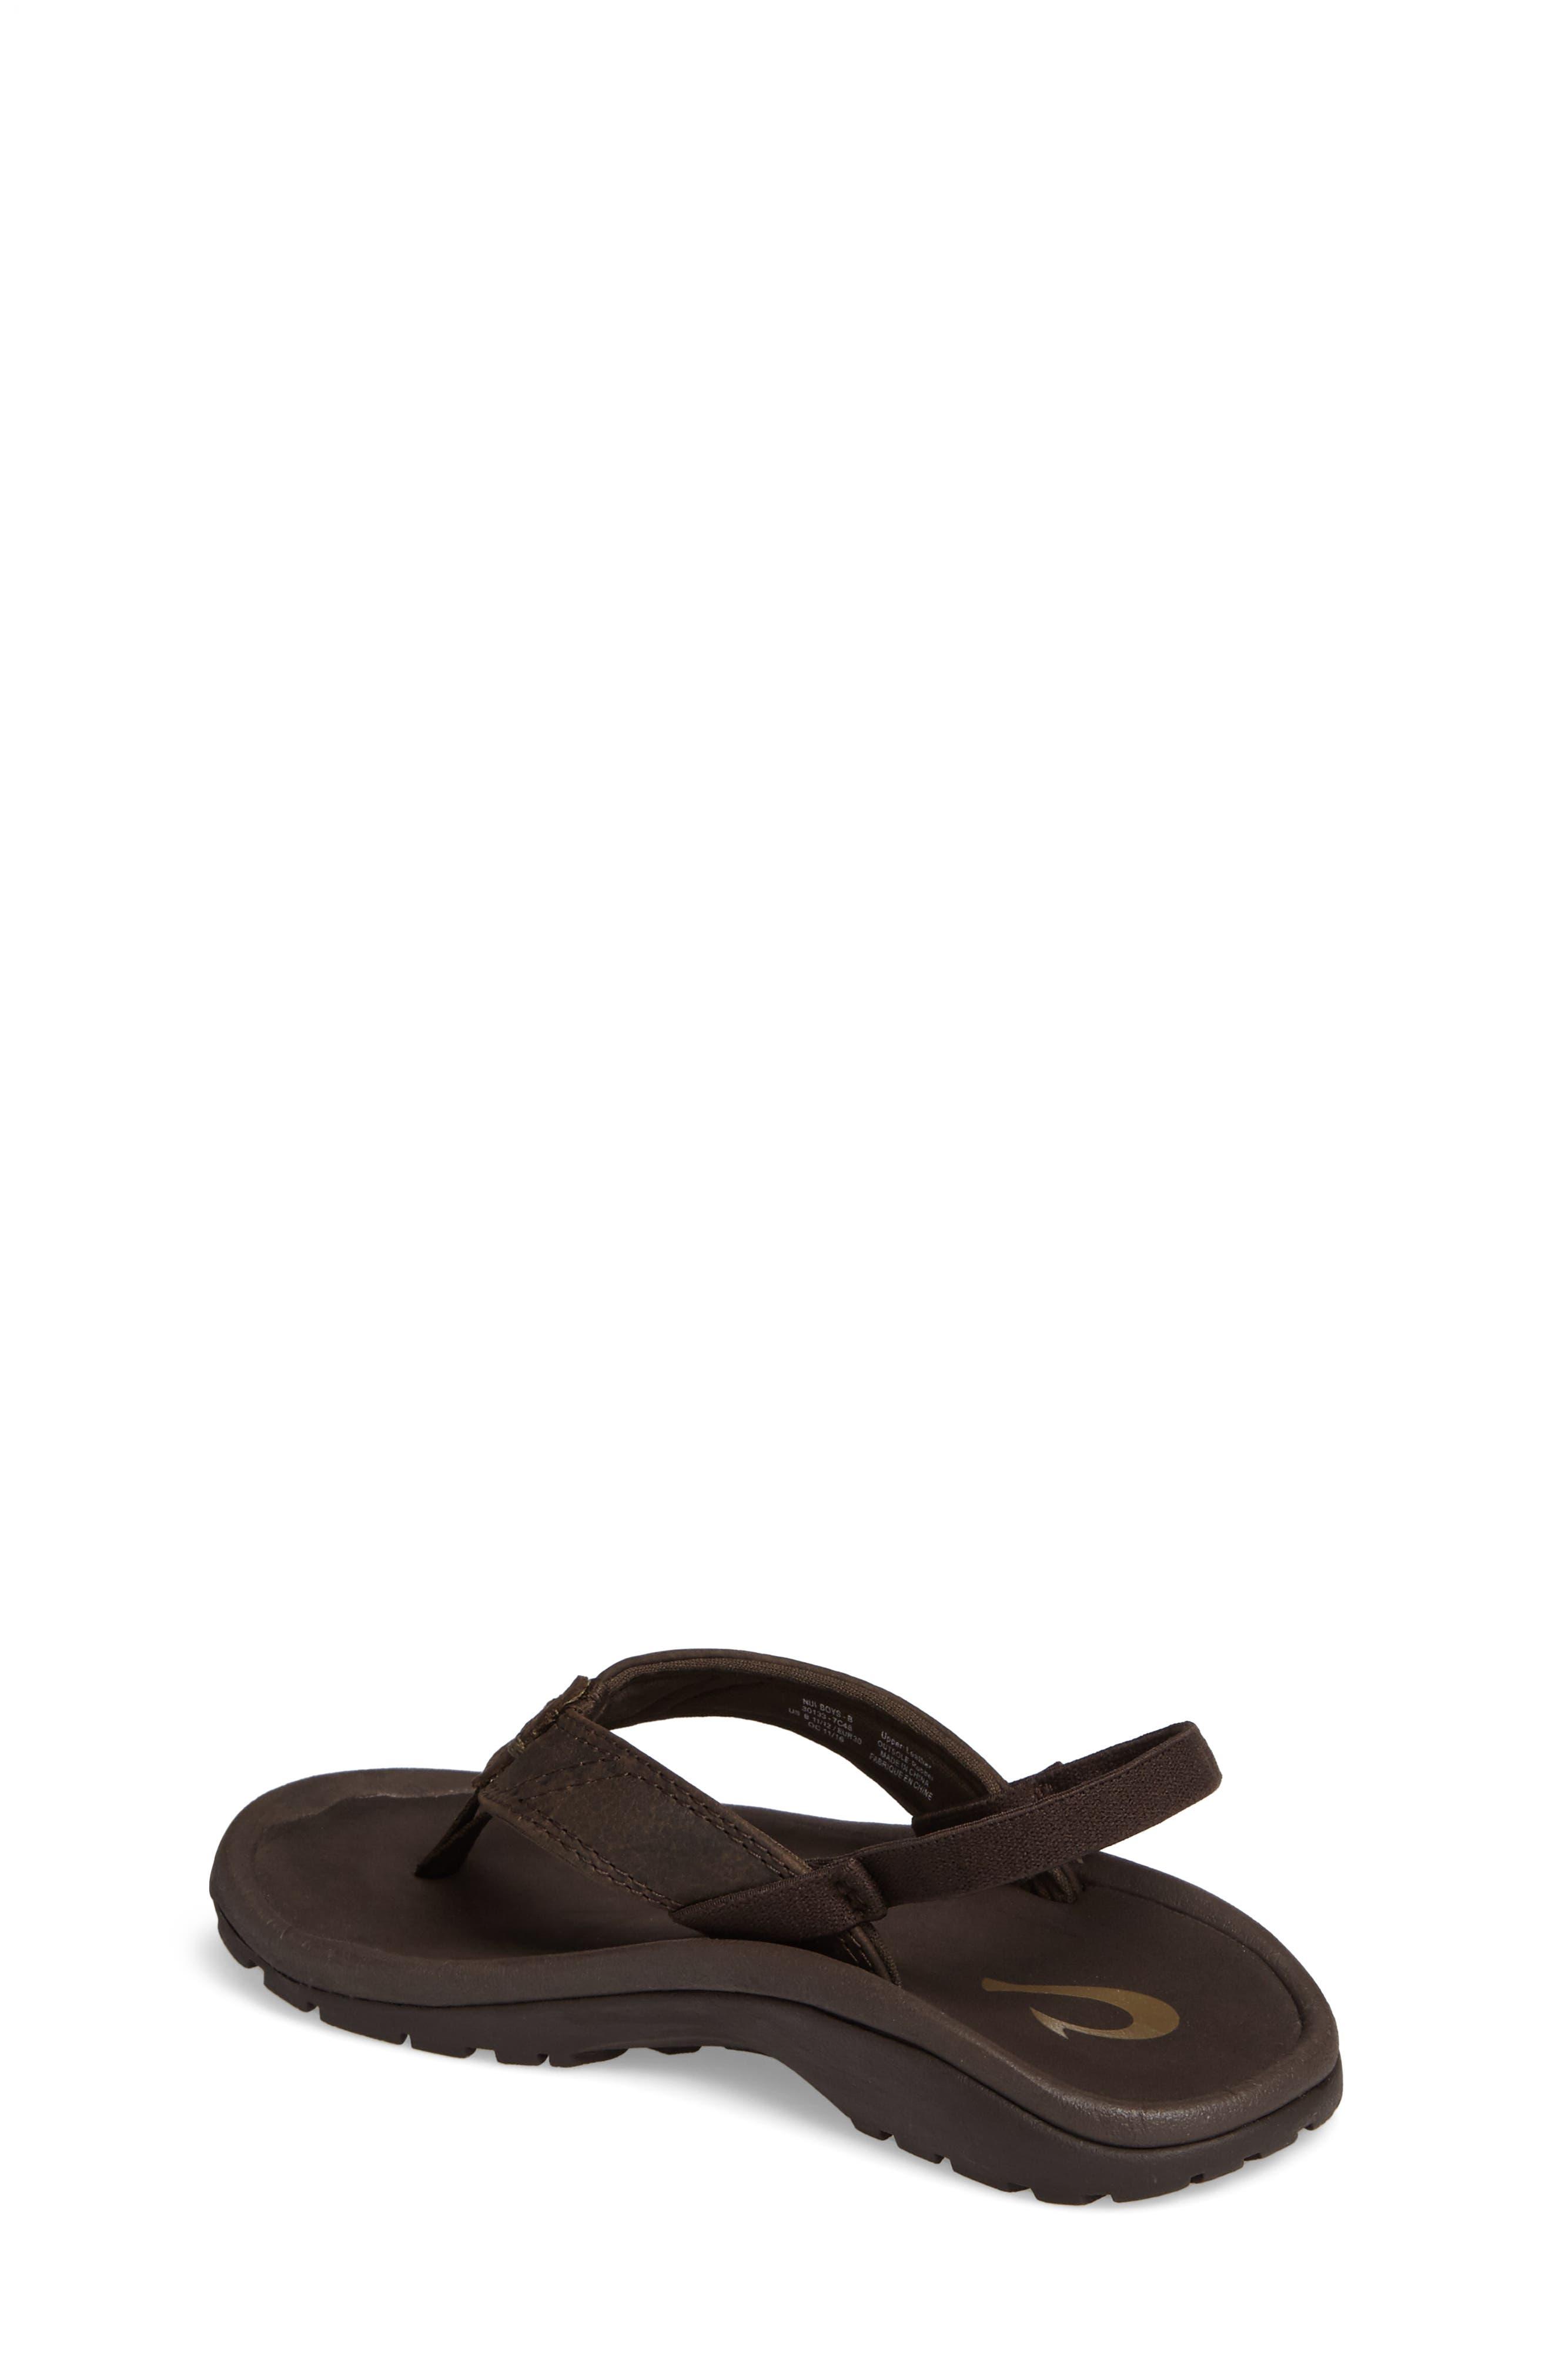 Alternate Image 2  - OluKai Nui Leather Sandal (Toddler)